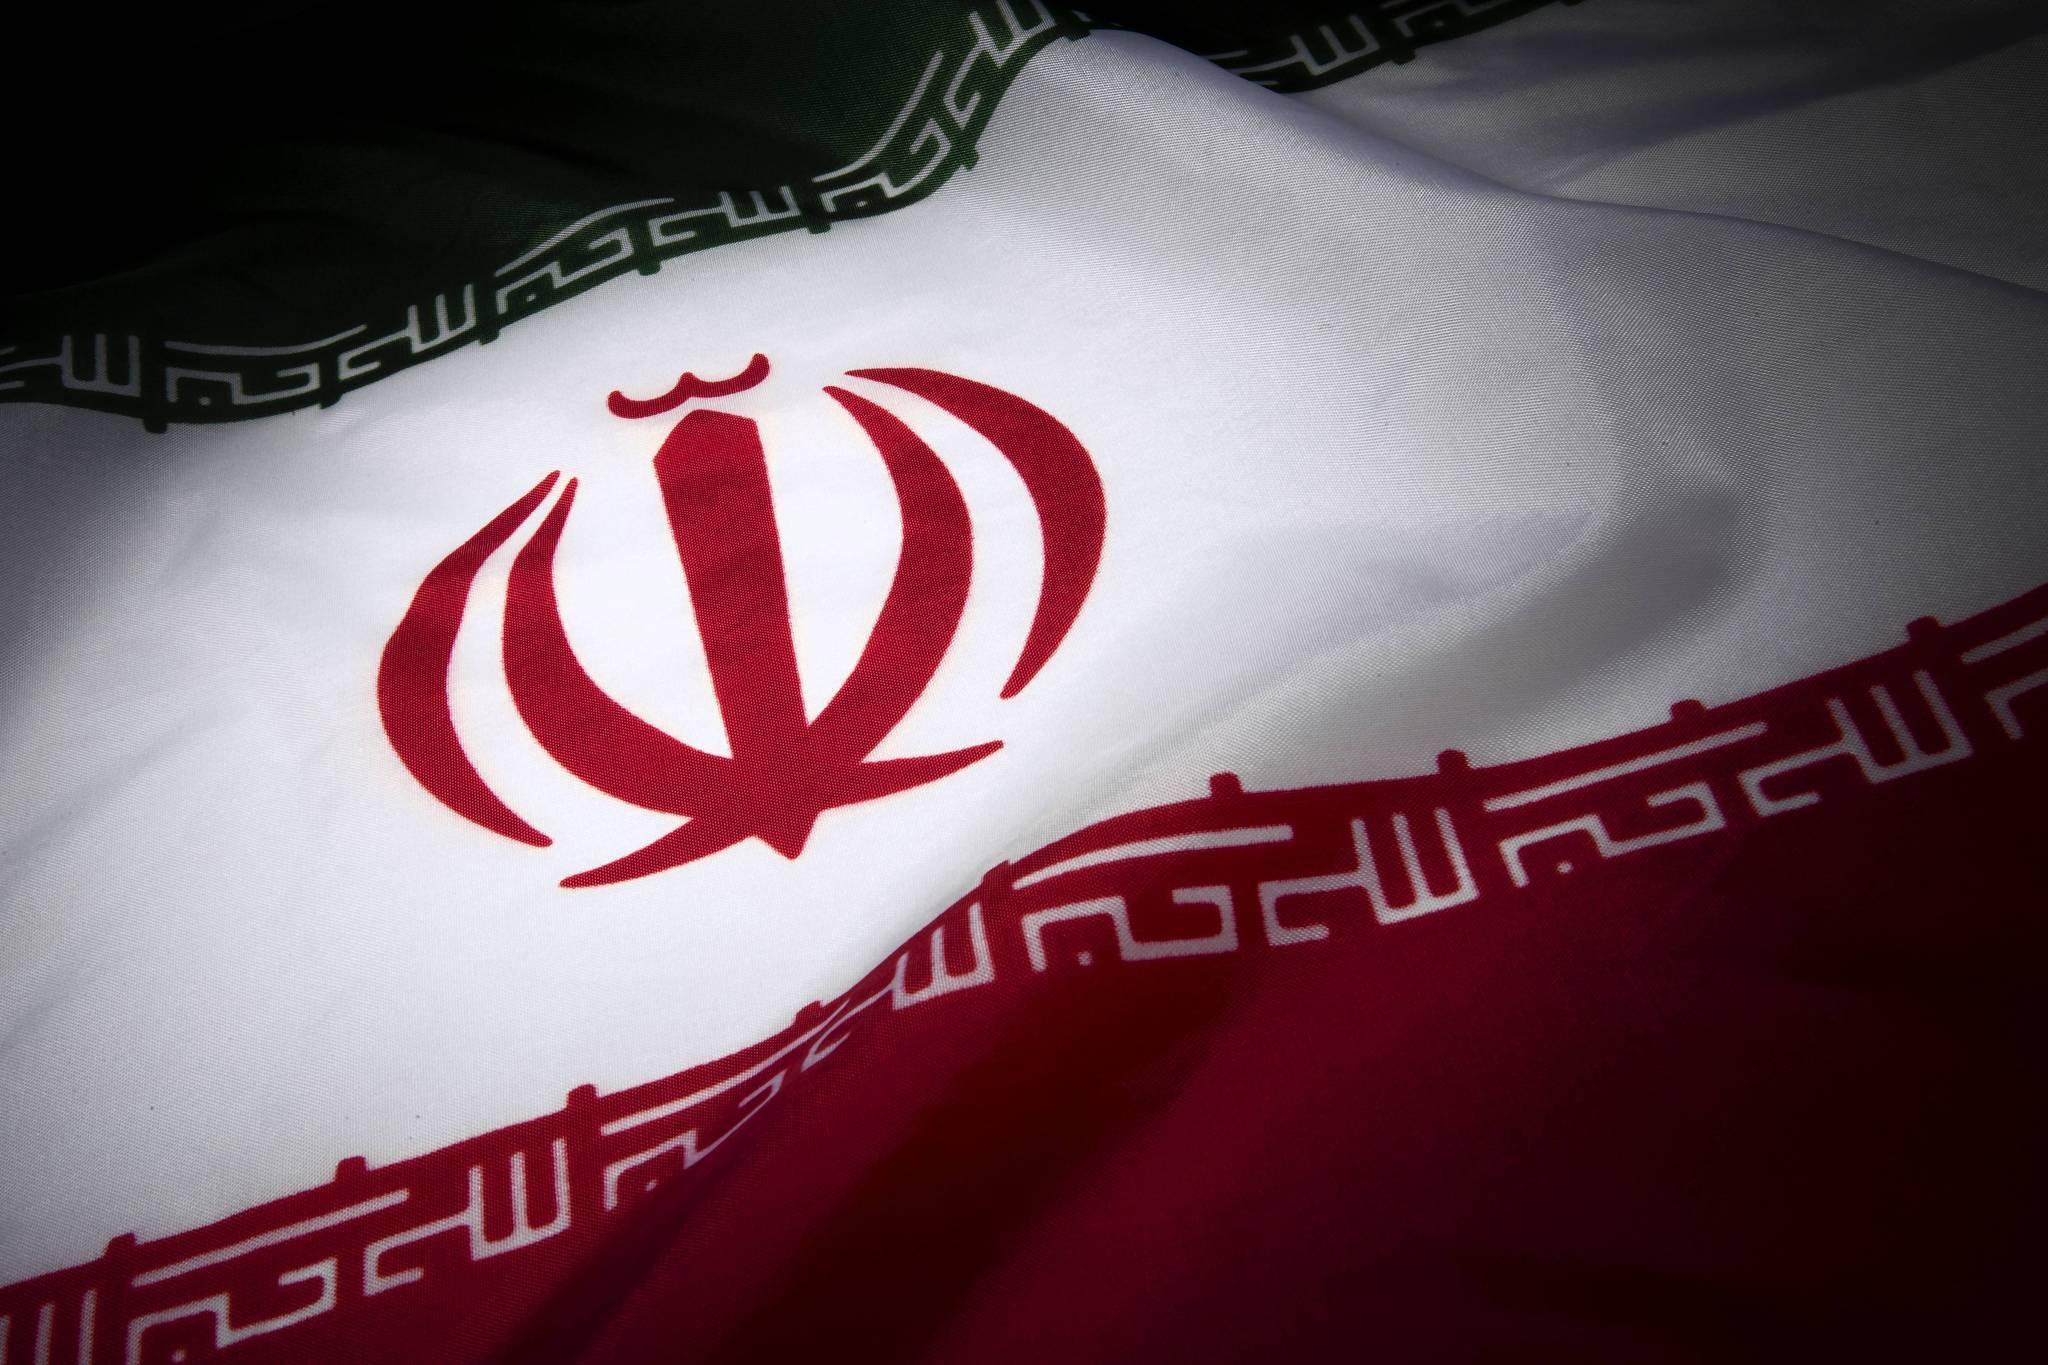 The Iranian flag.